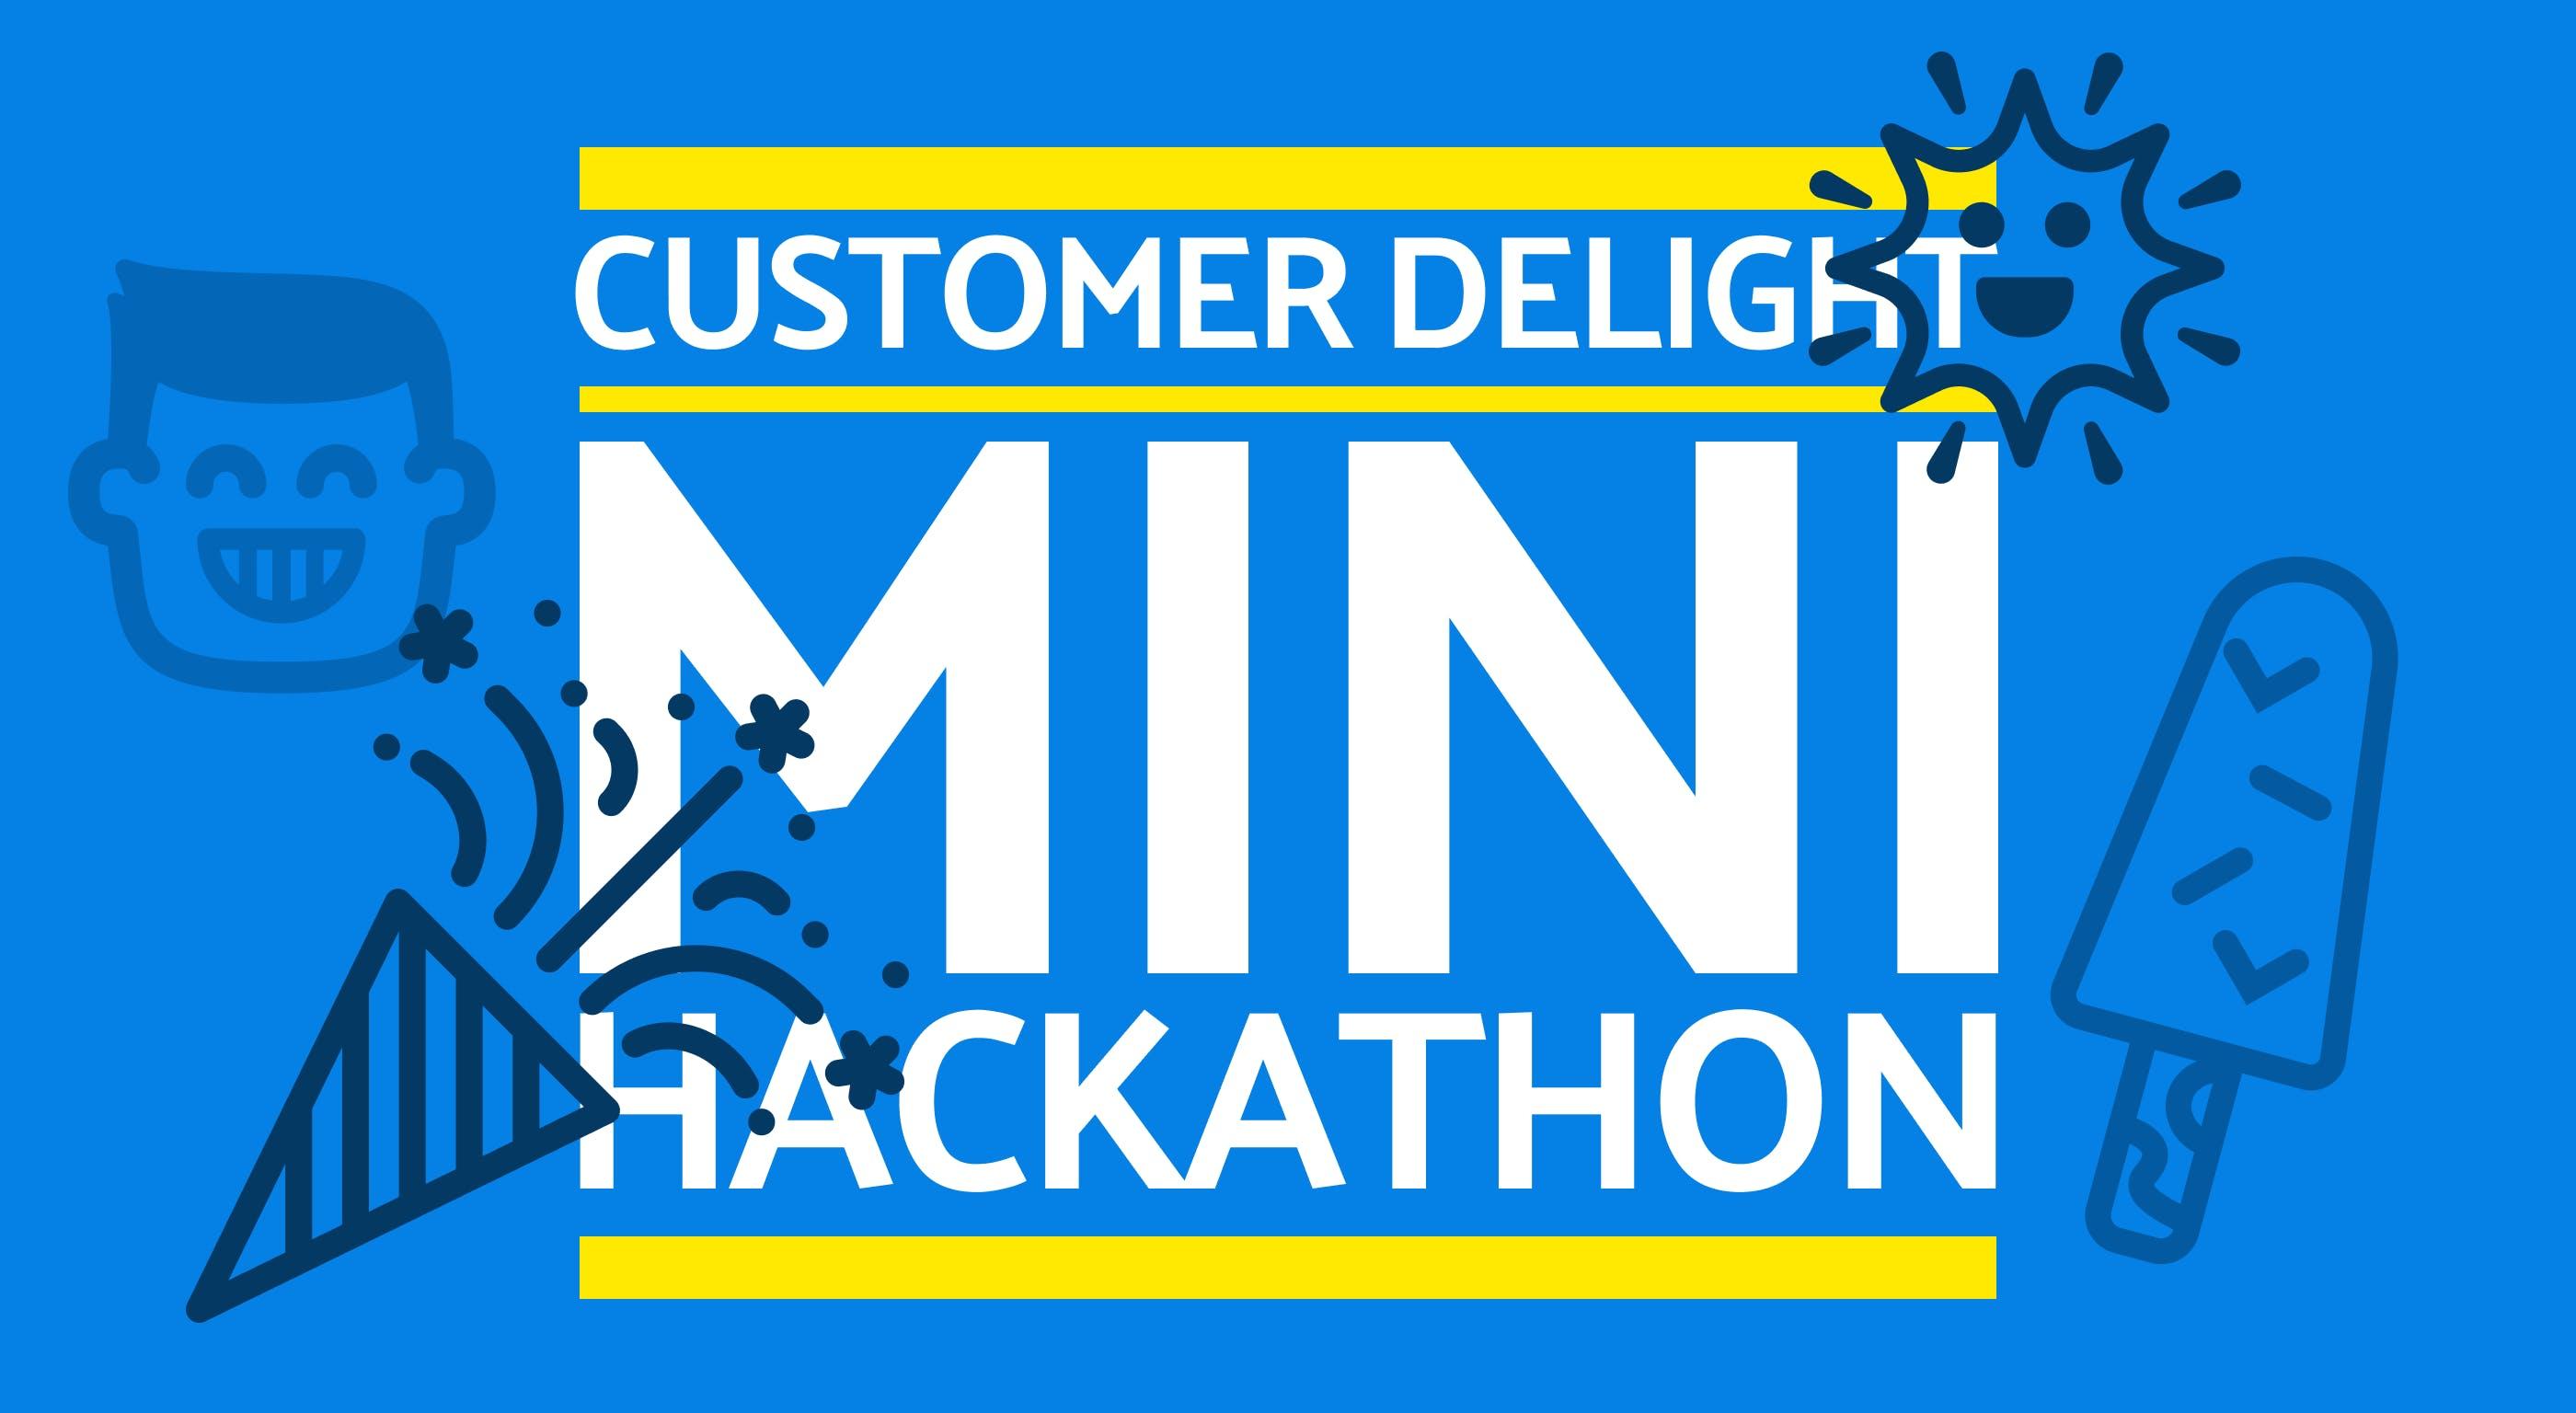 Cuckoo customer delight mini-hackathon June 2021